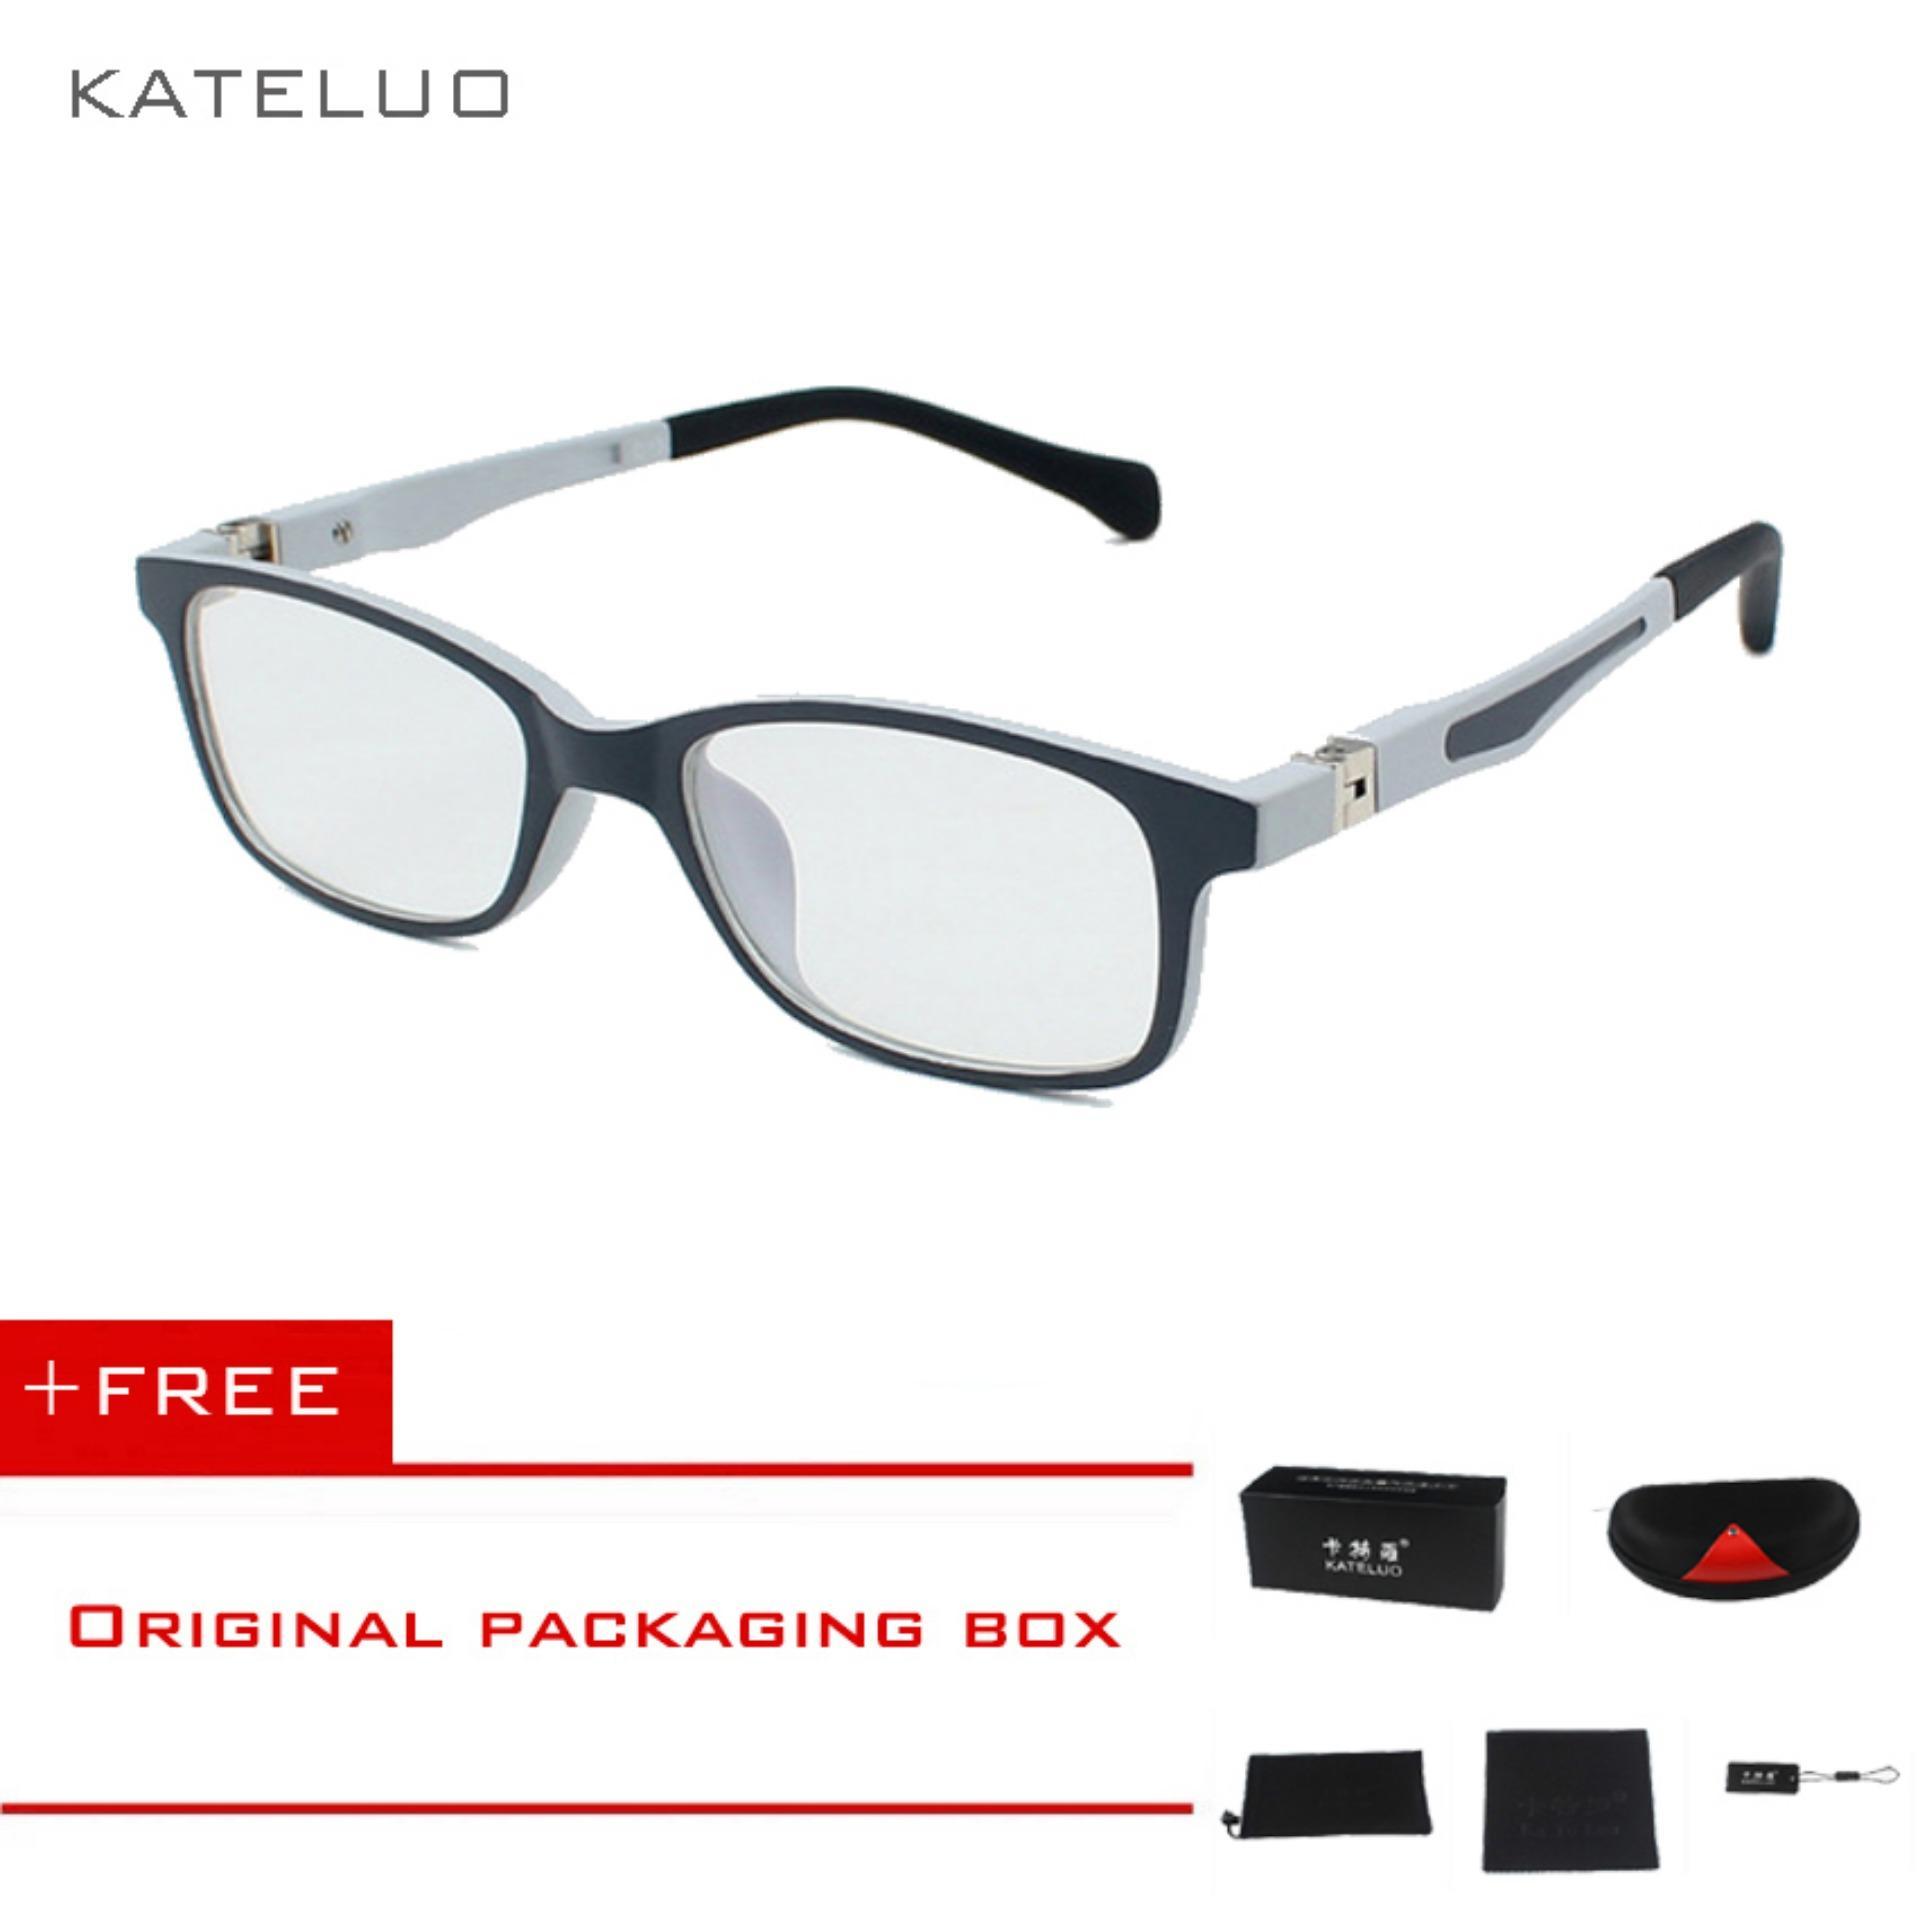 KATELUO tempat anti-Komputer Biru kelelahan laser radiasi-tahan kacamata bingkai kacamata anak F1021